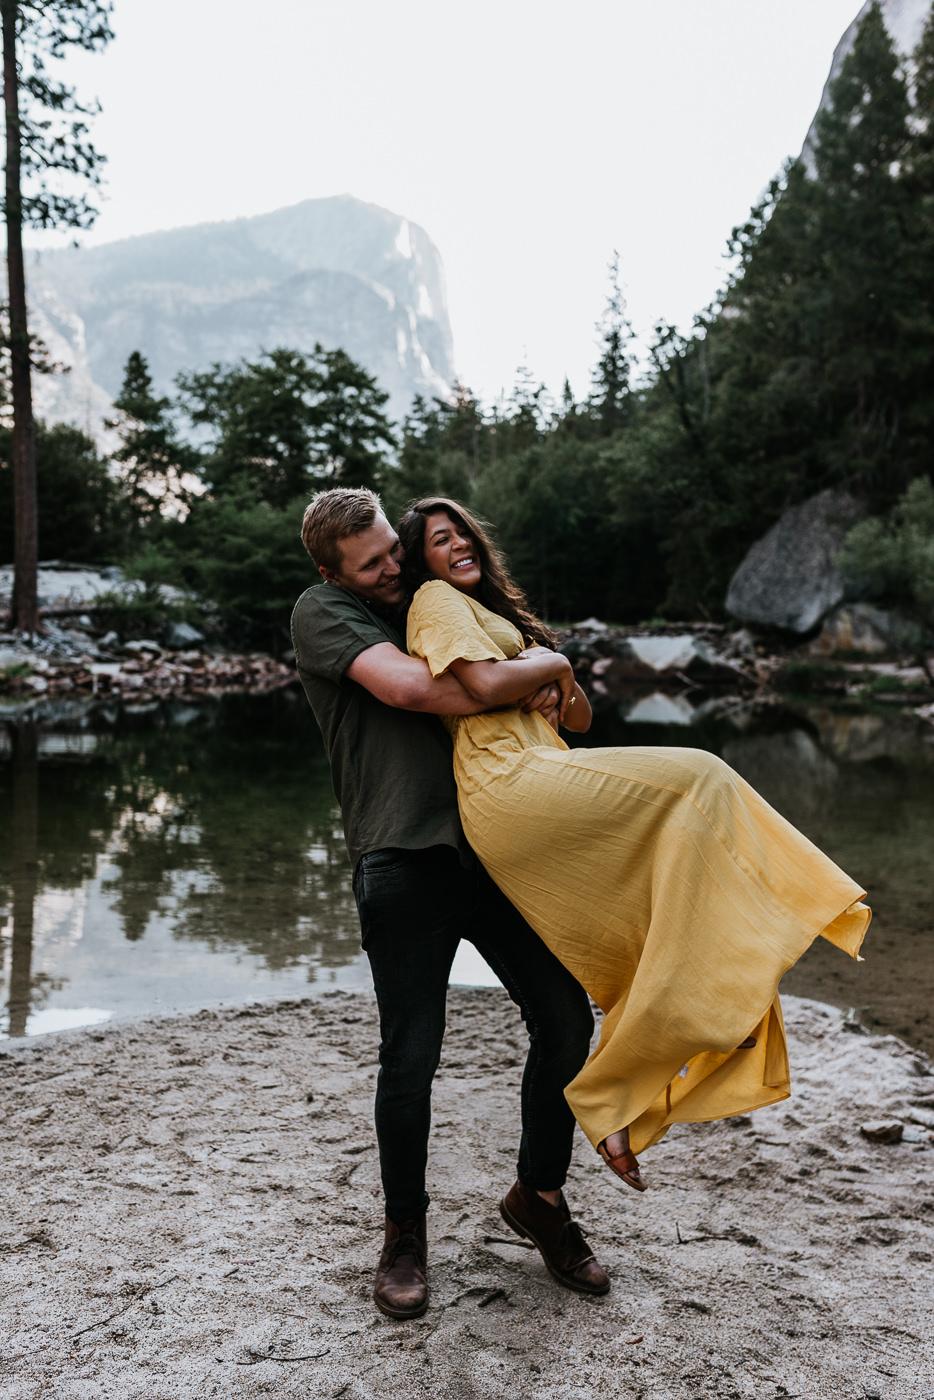 Couples-Photography-Session-Yosemite-National-Park-2.jpg